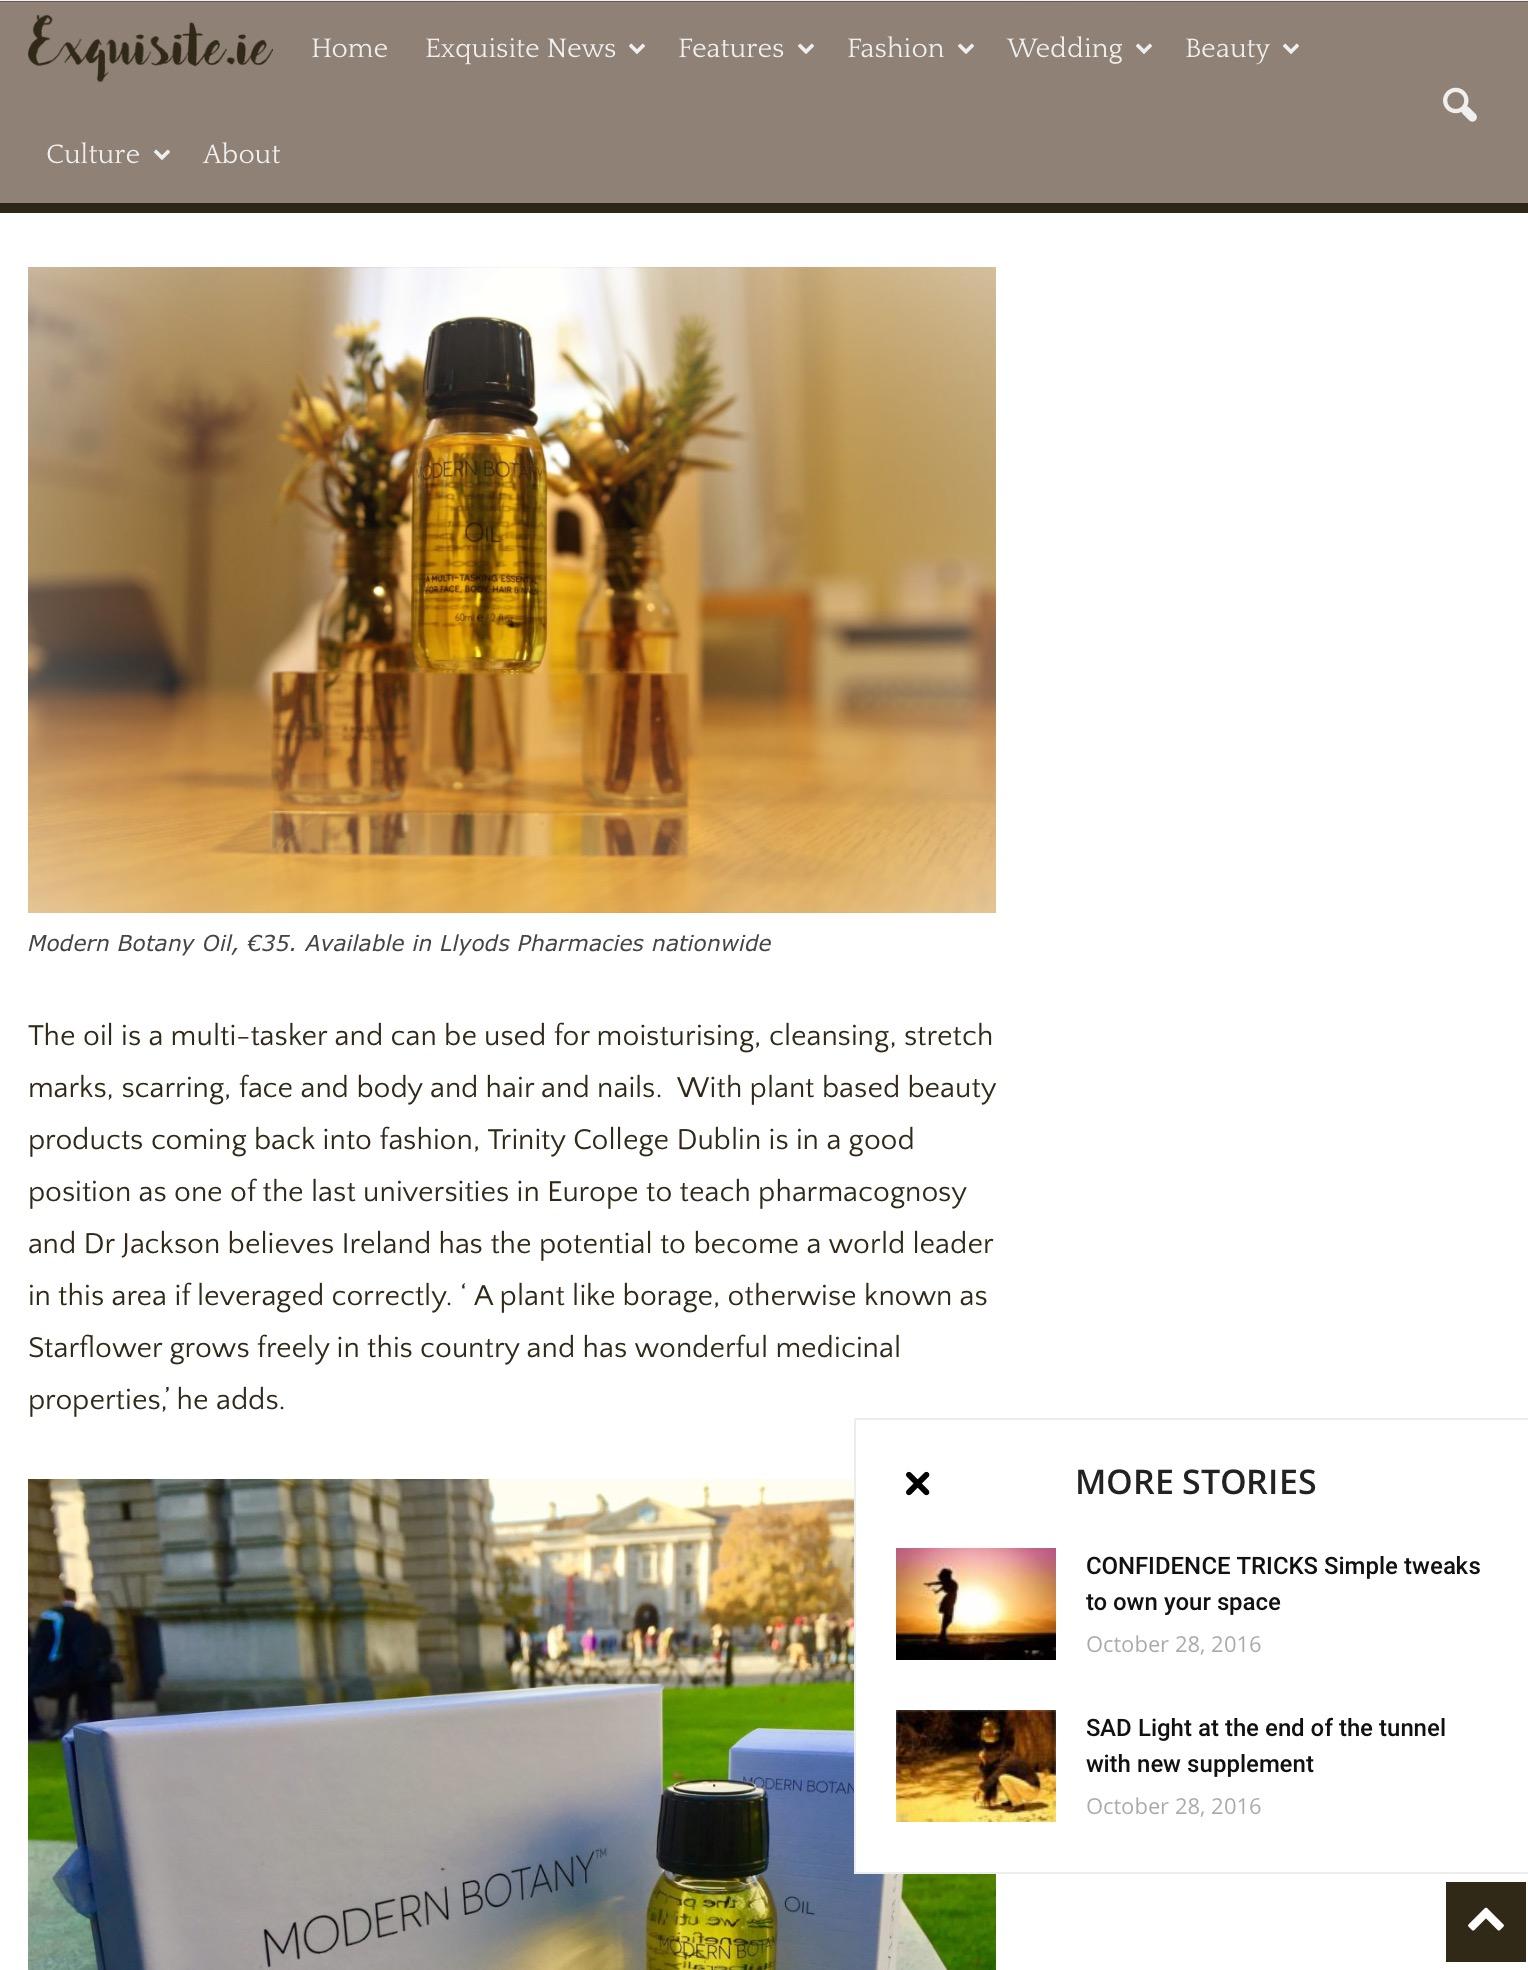 Exquisite.ie online magazine